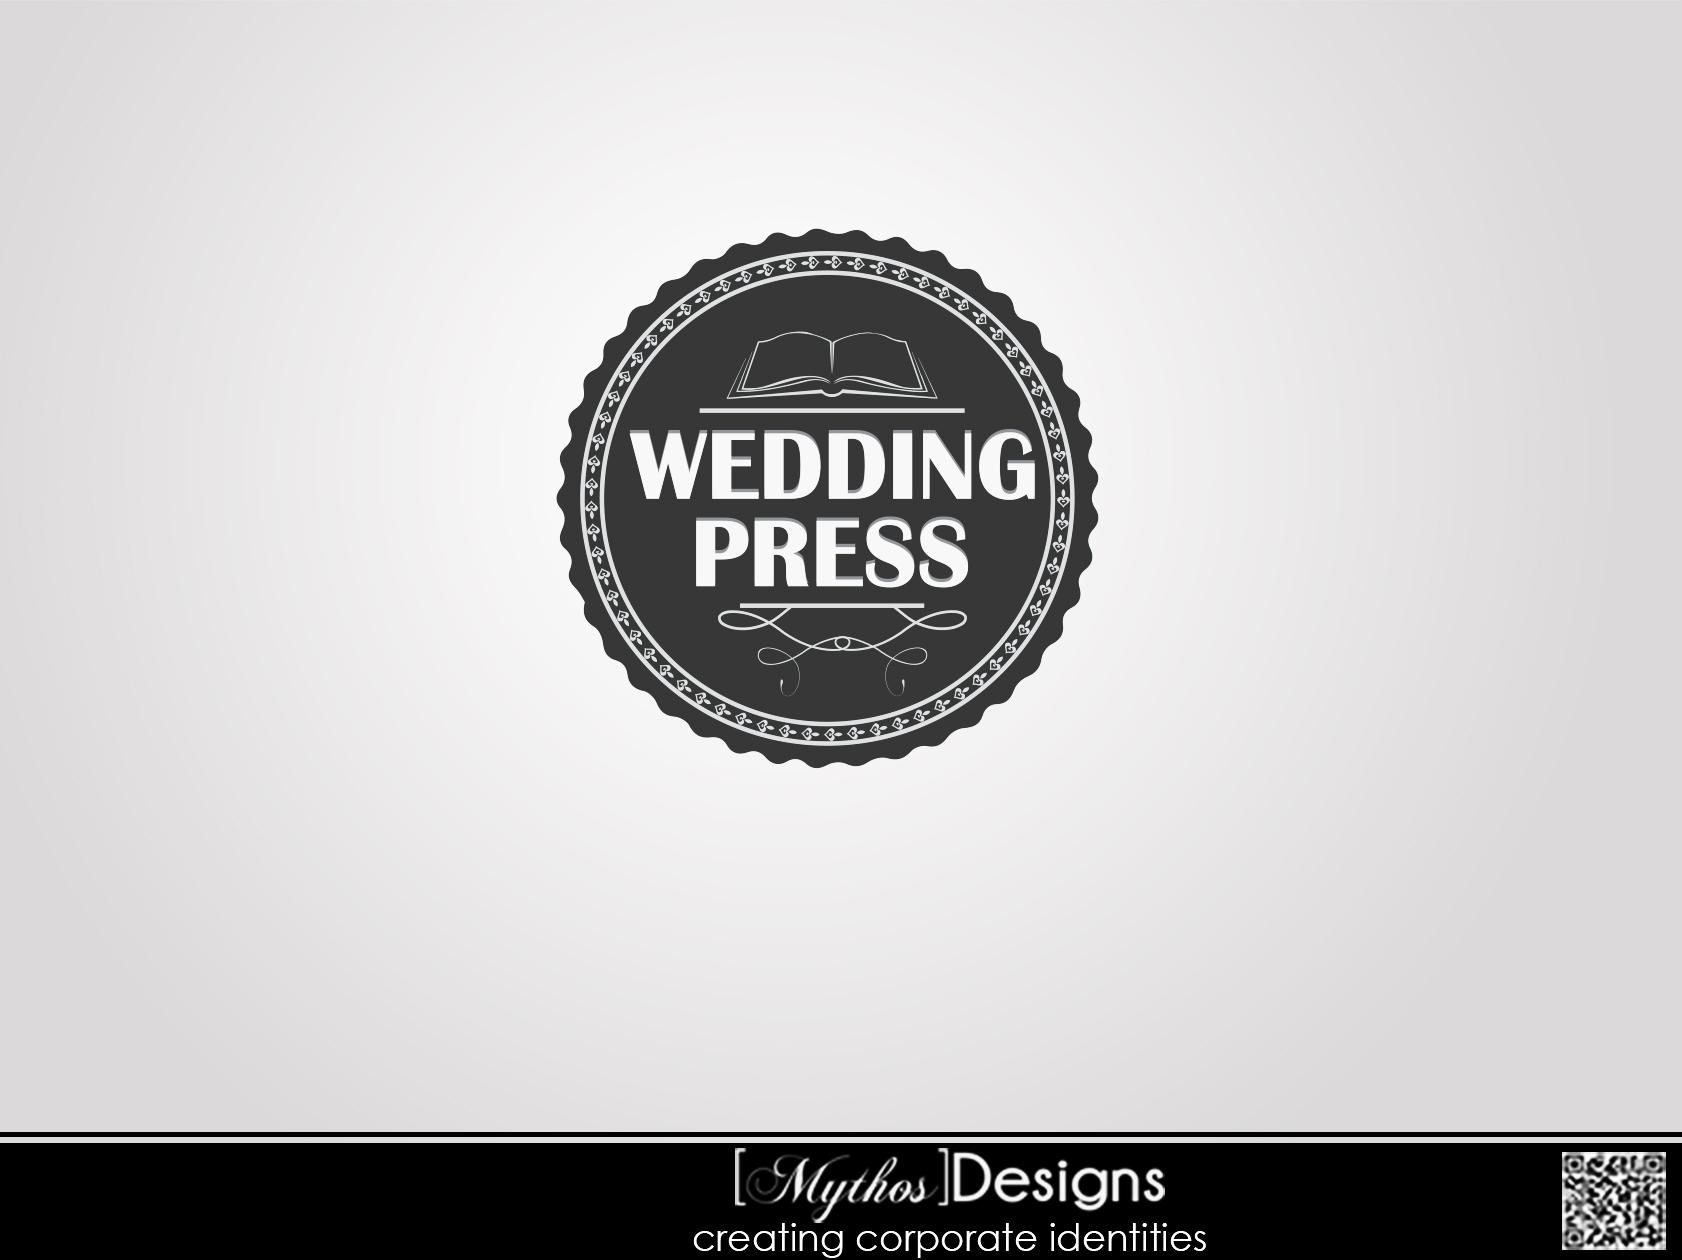 Logo Design by Mythos Designs - Entry No. 165 in the Logo Design Contest Wedding Writes Logo Design.